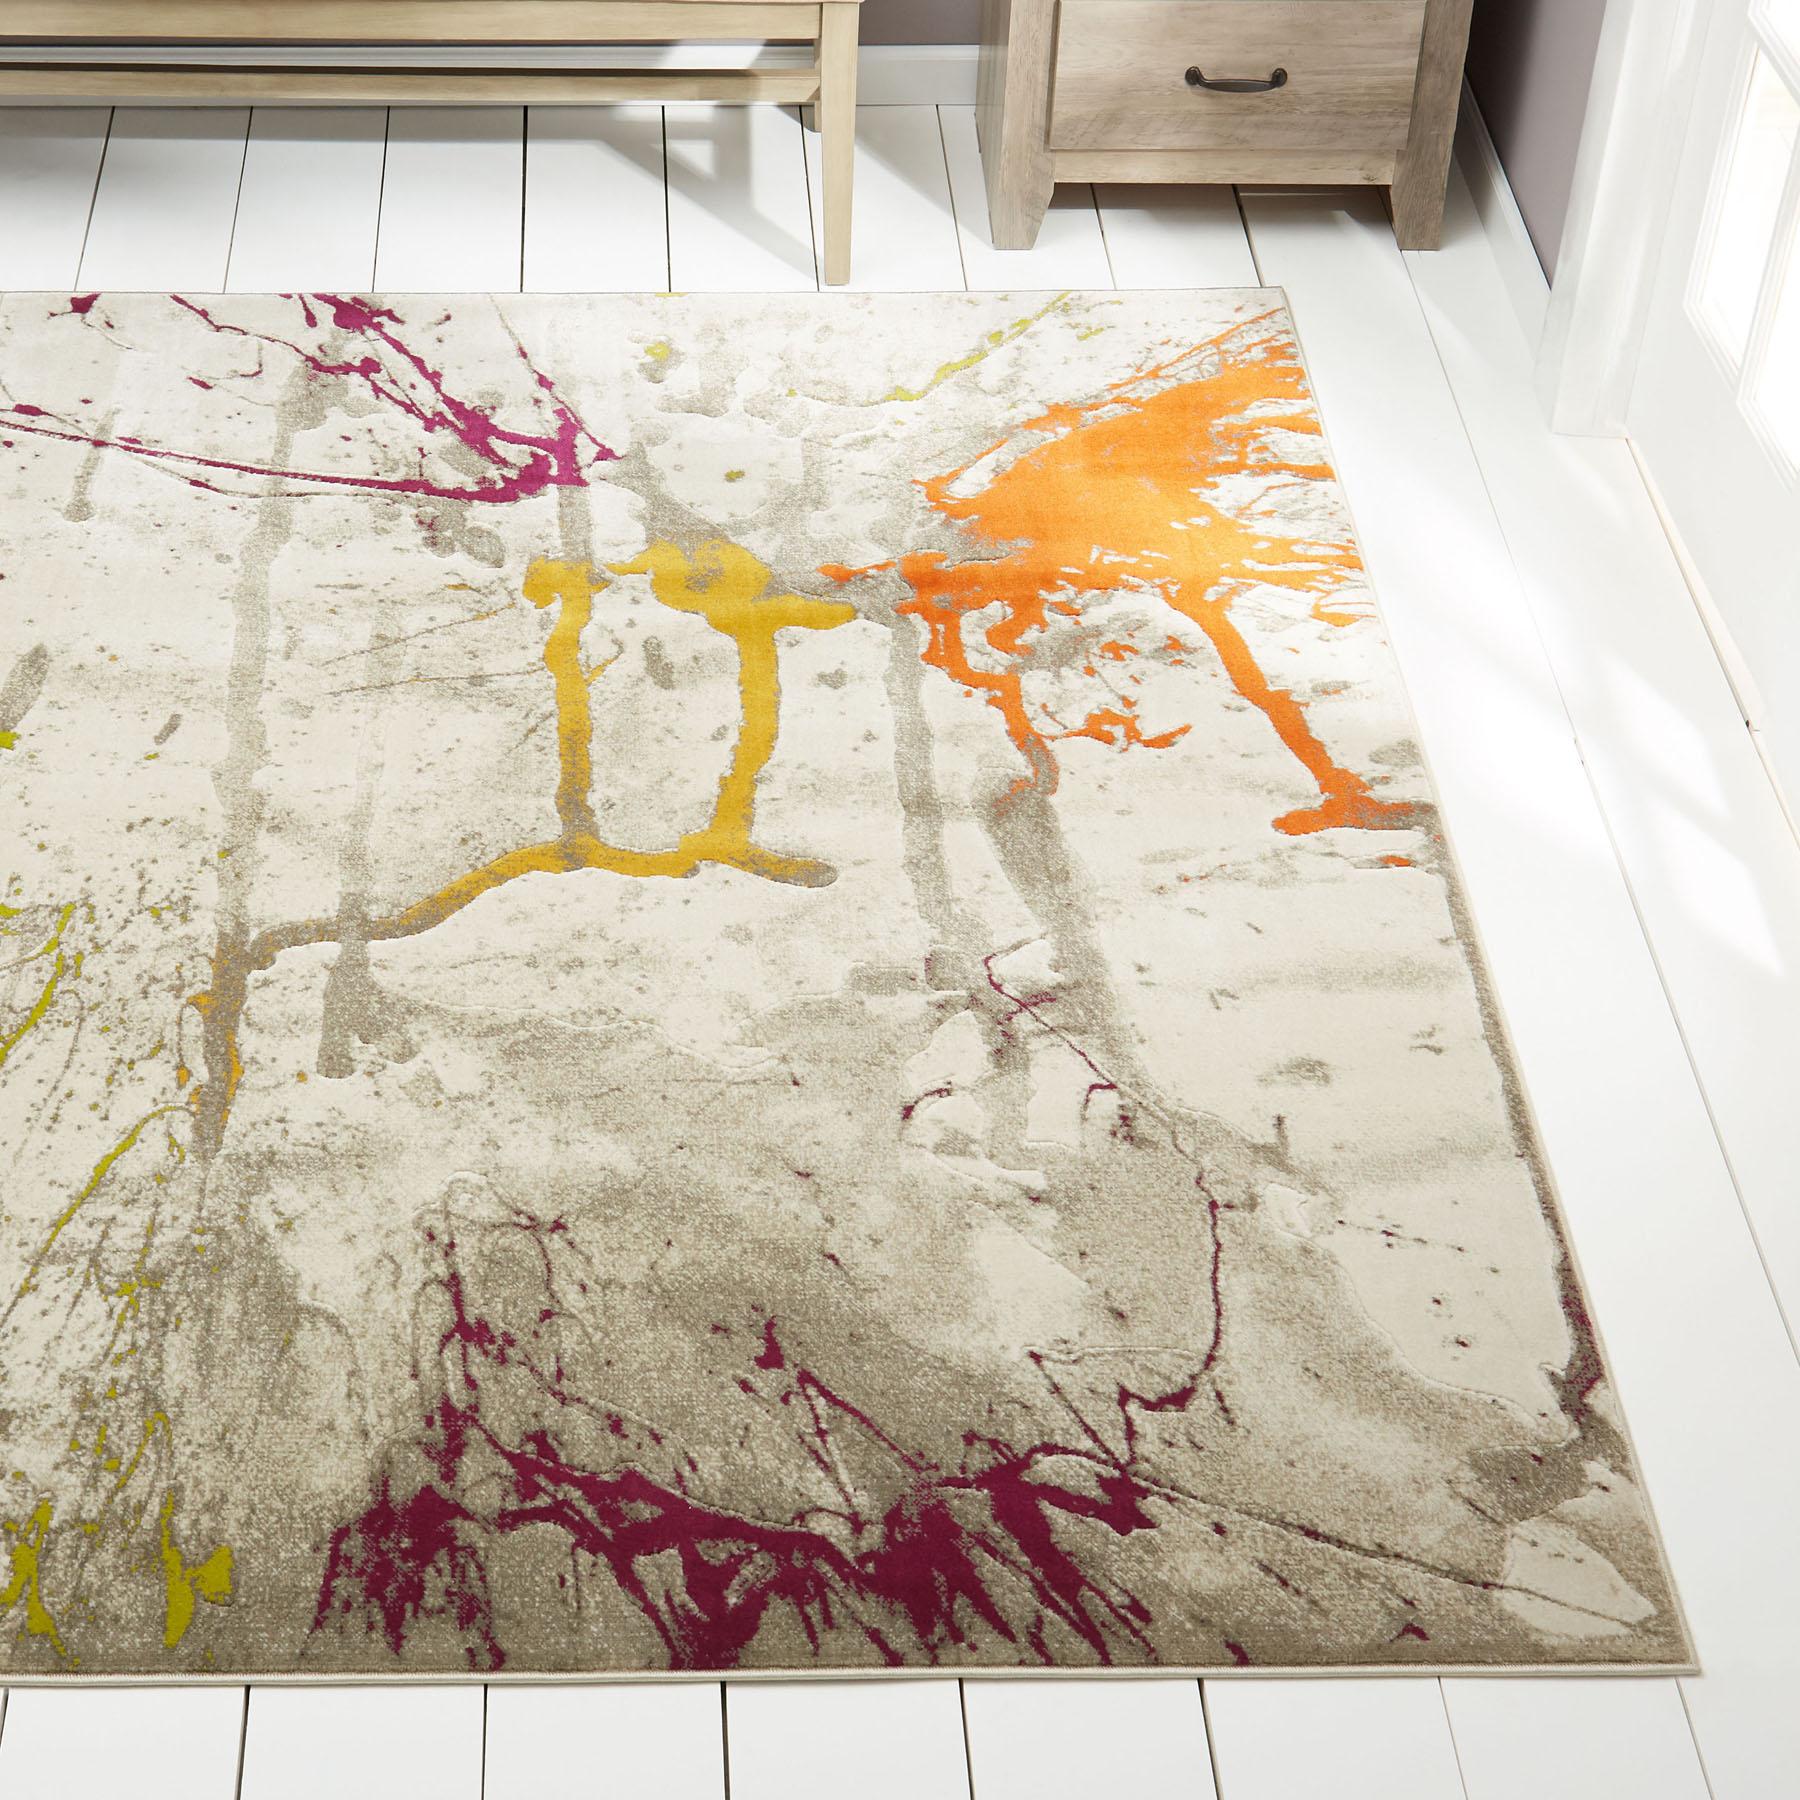 Rugs Multi Color Area Rug Abstract Paint Splatter Floor